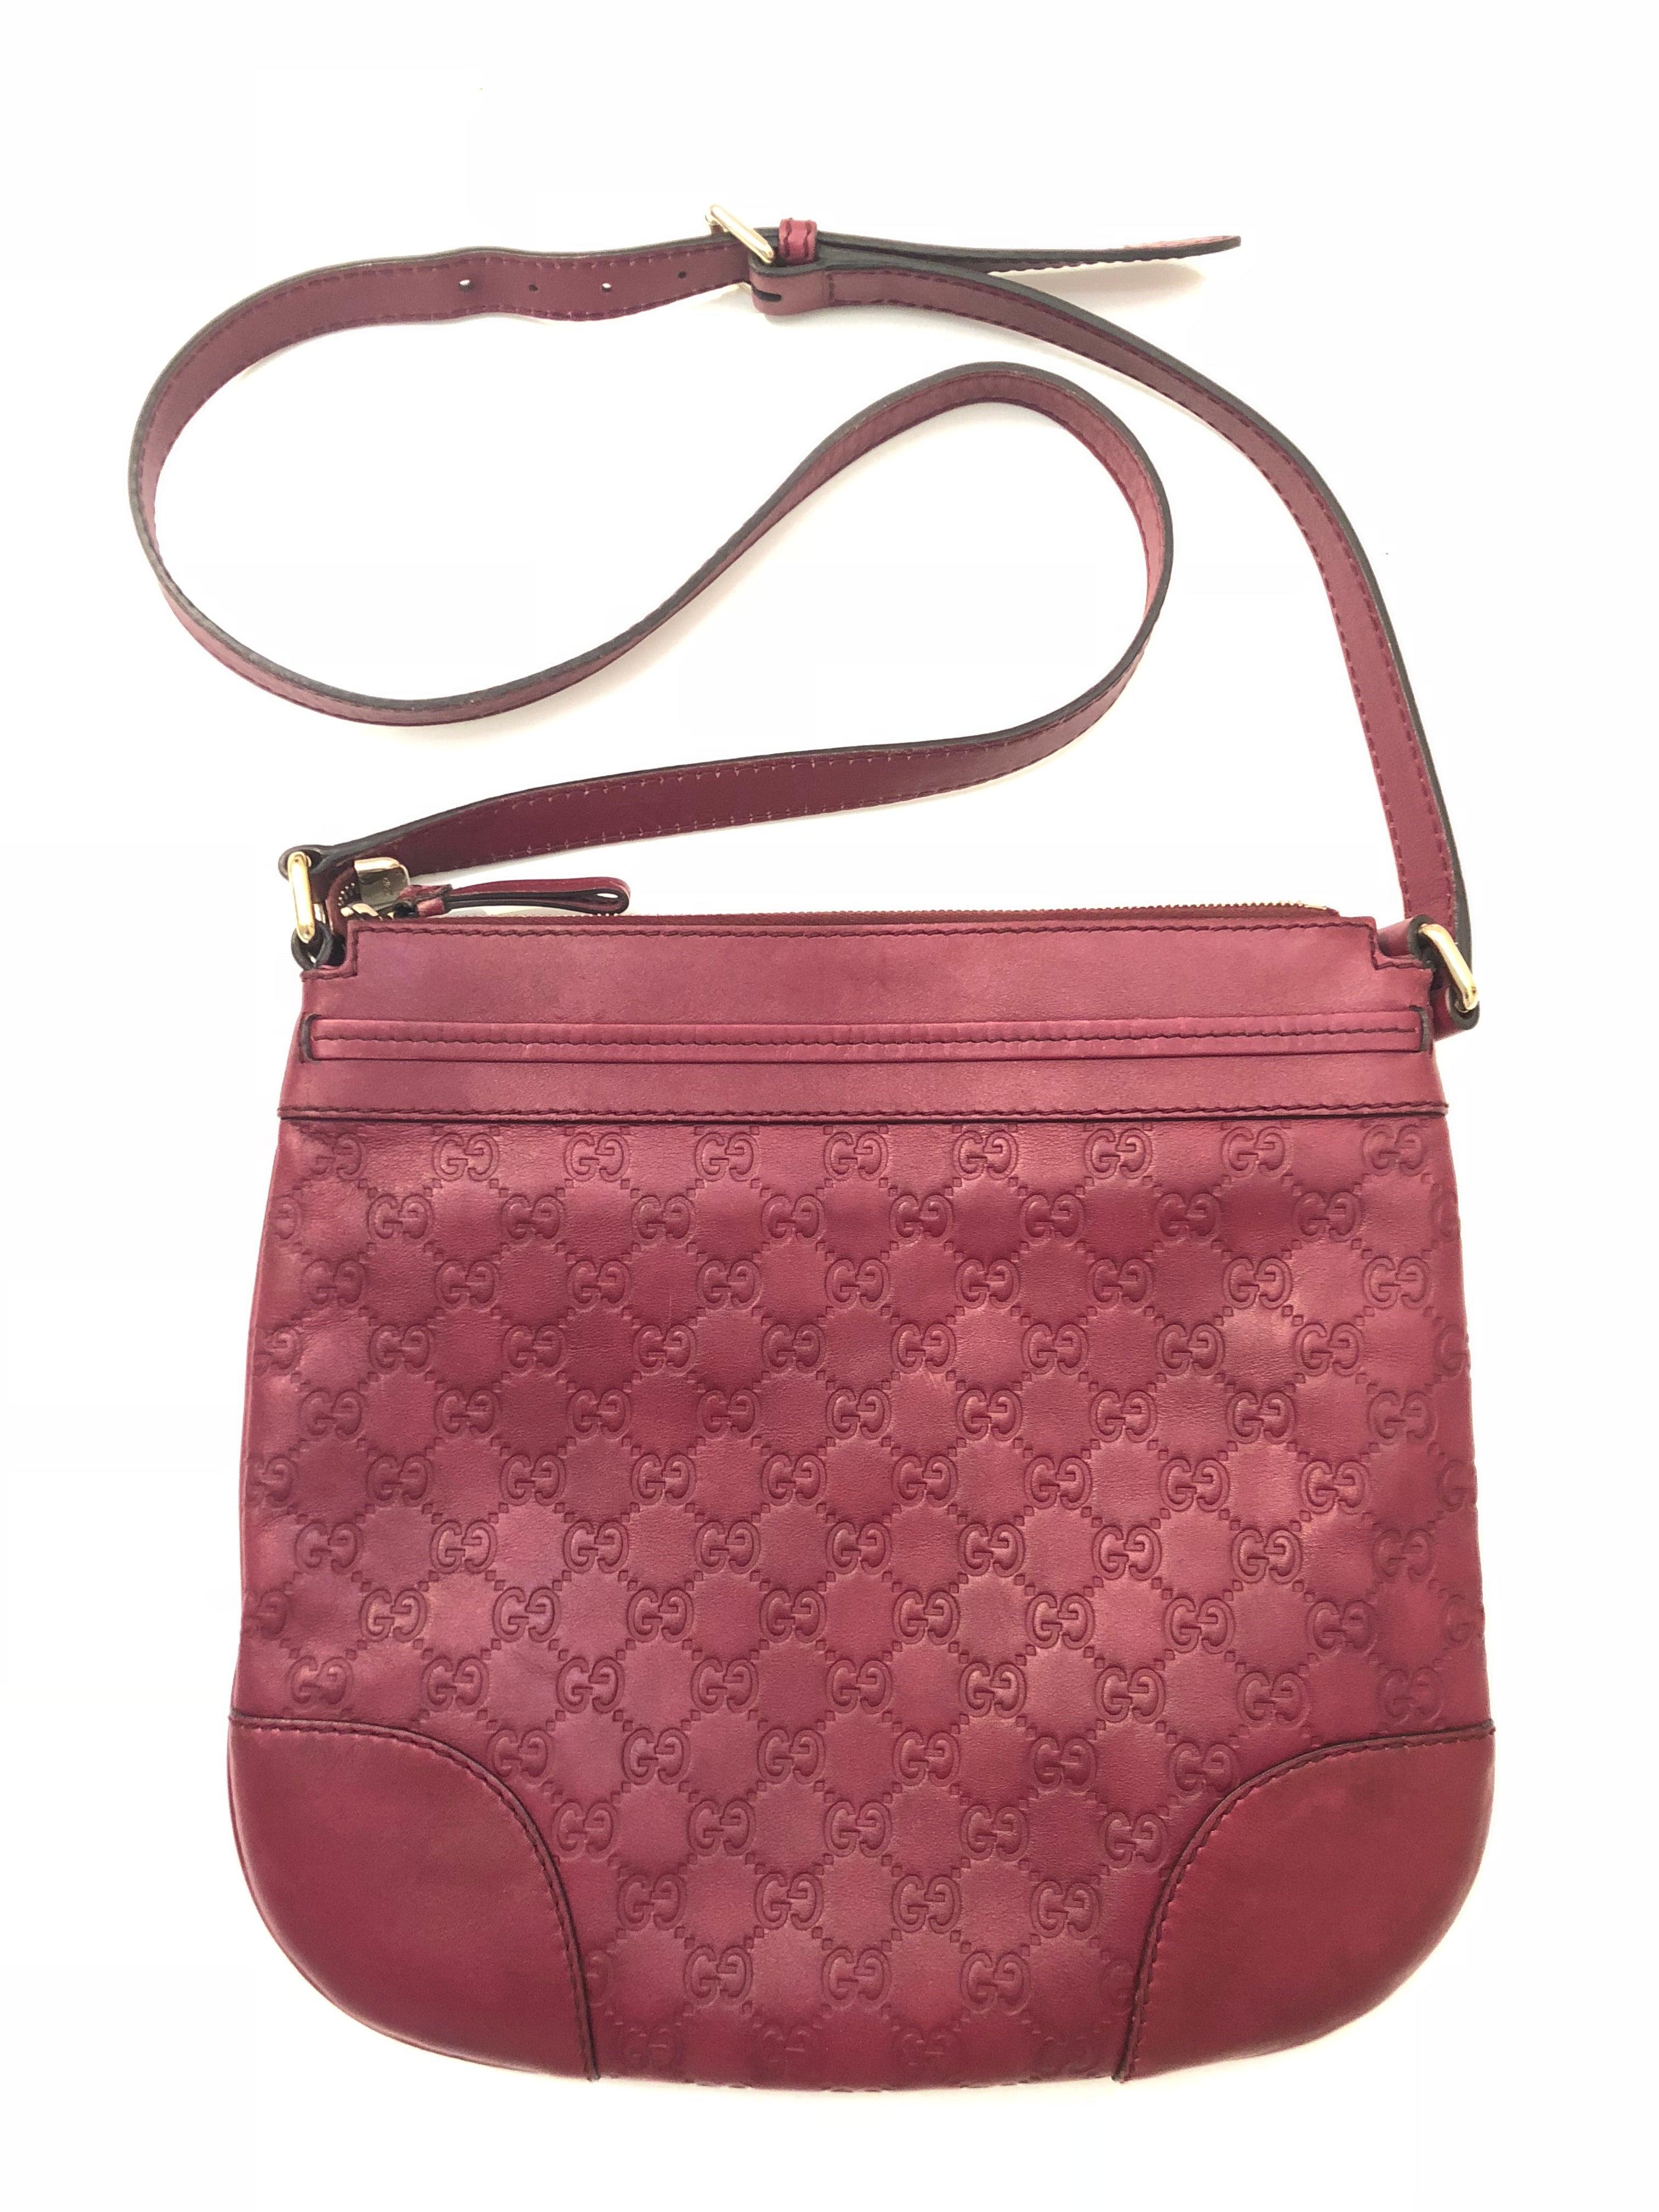 a8f8cbef6418f1 Gucci Guccissima Monogram Crossbody Bag For Sale at 1stdibs